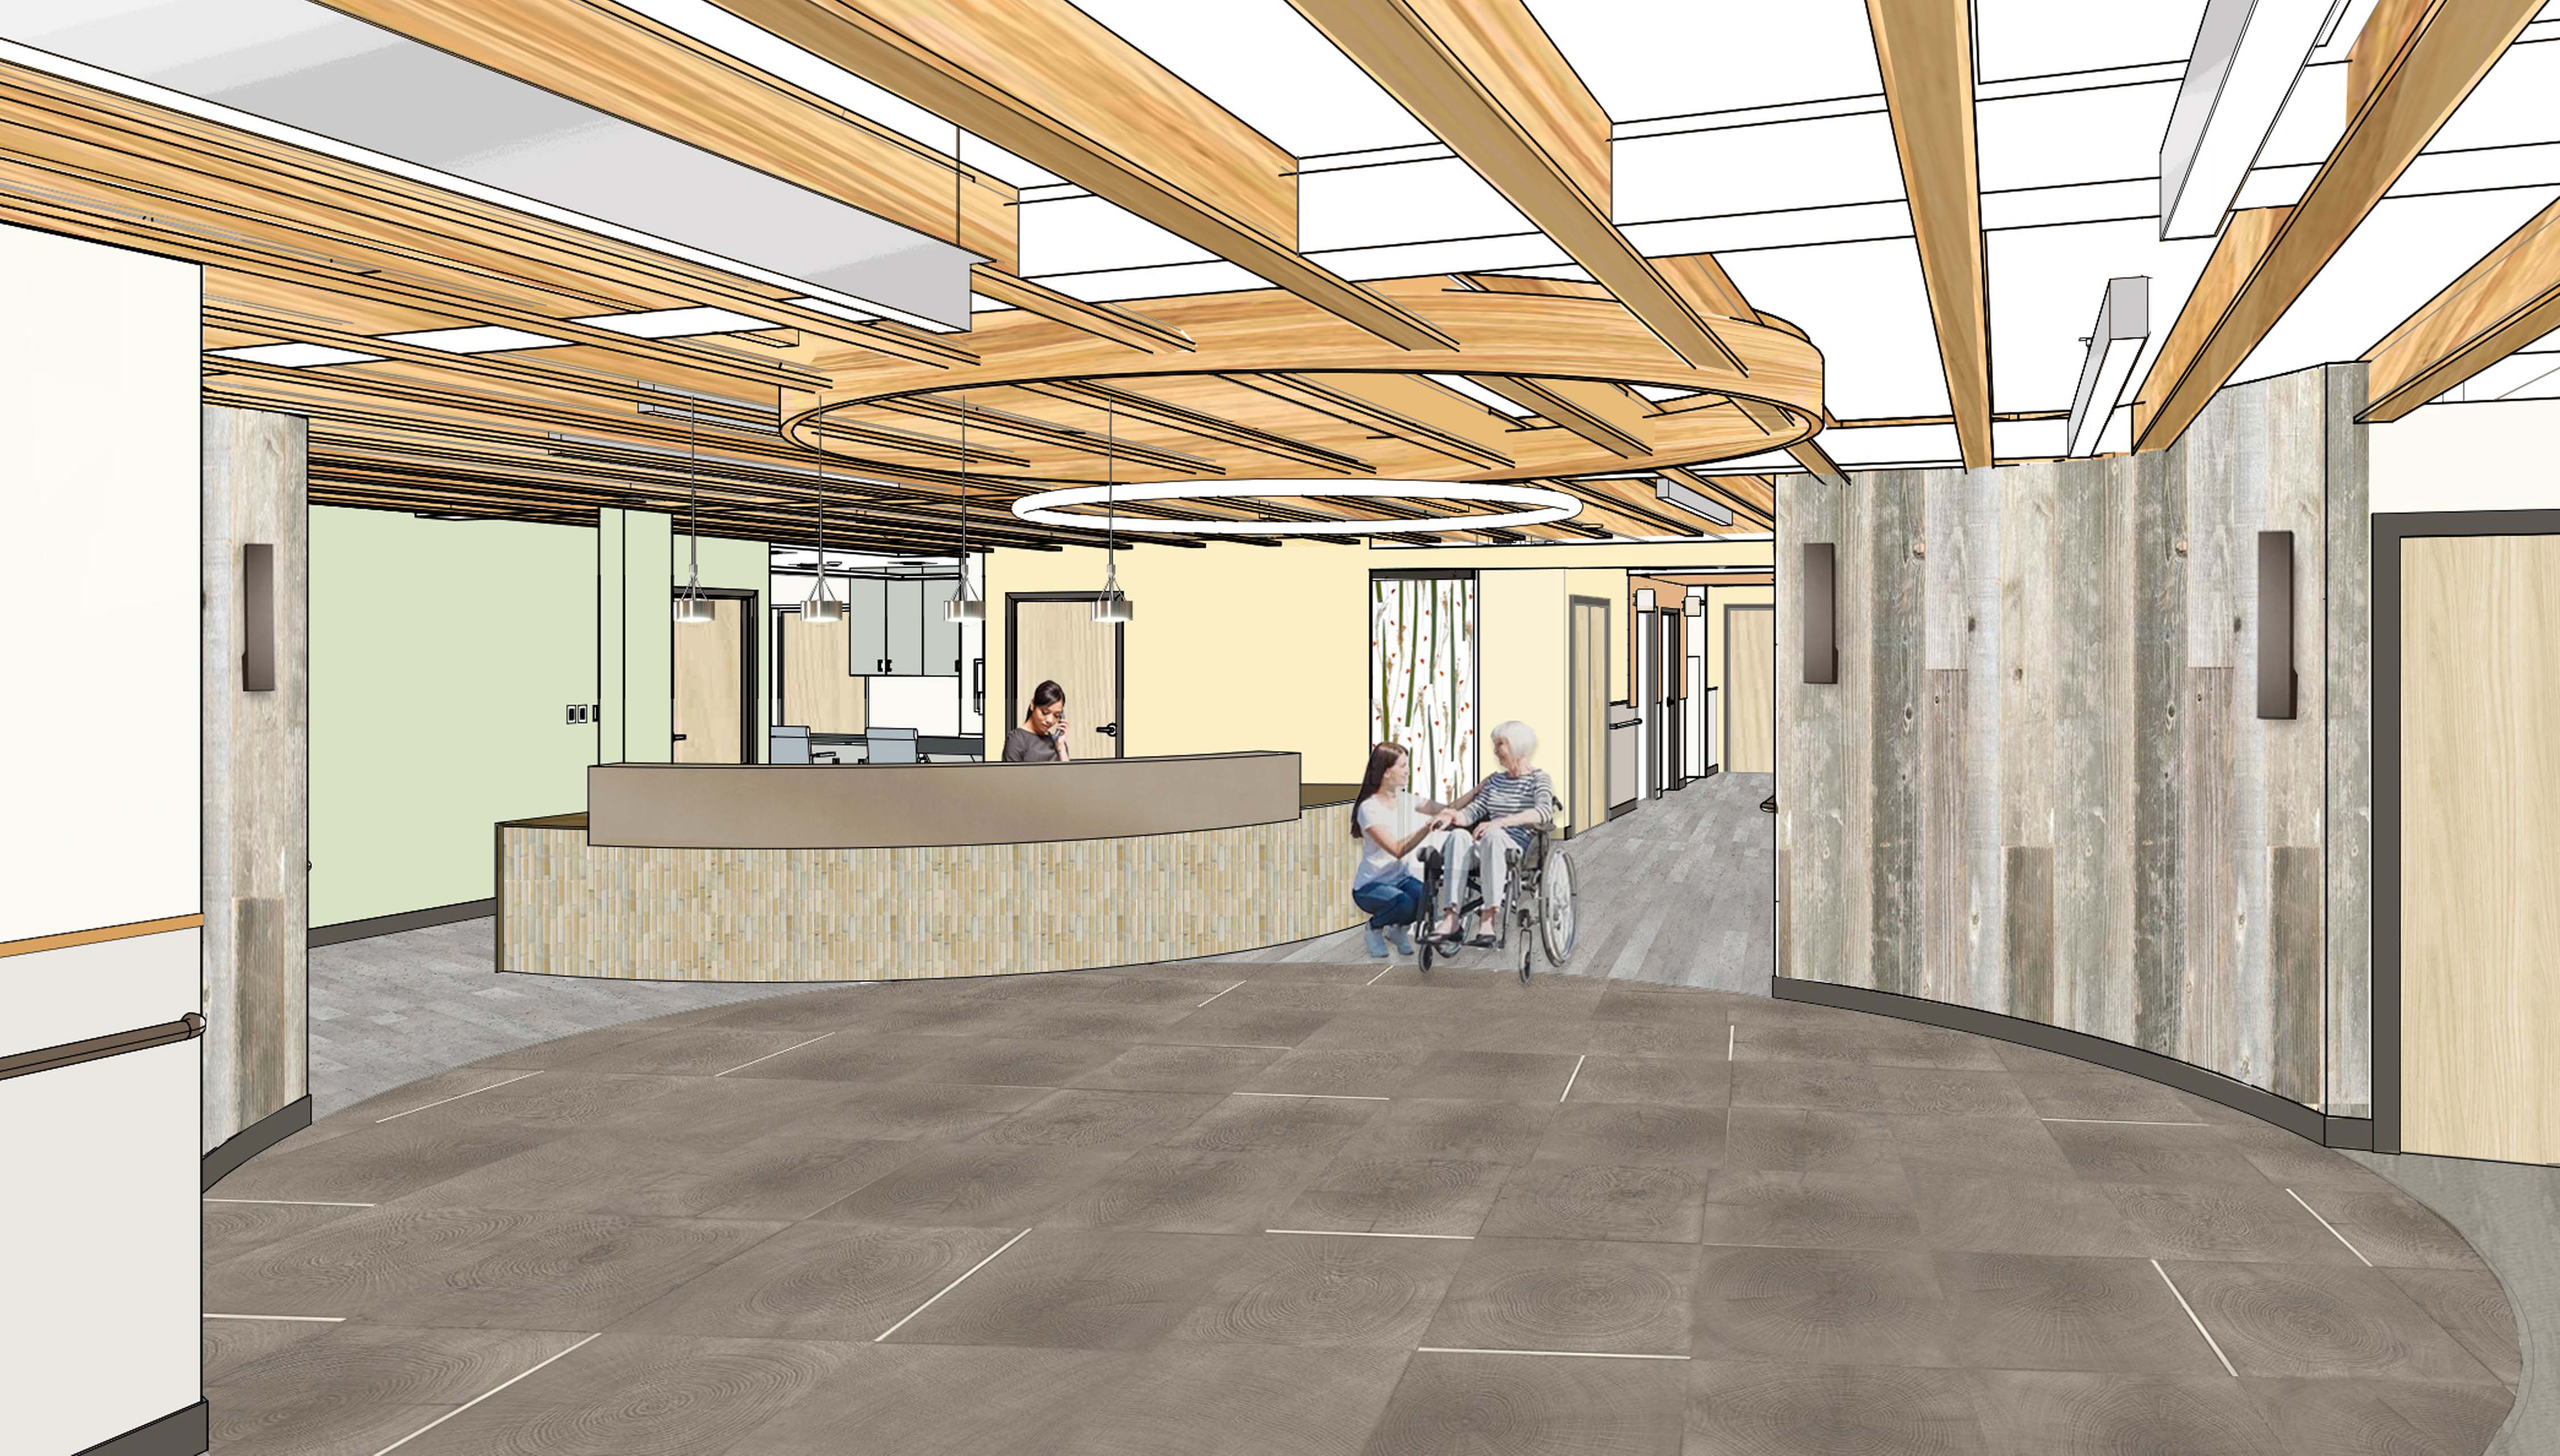 Wyoming Senior Living Skilled Nursing Architecture Digital Rendering